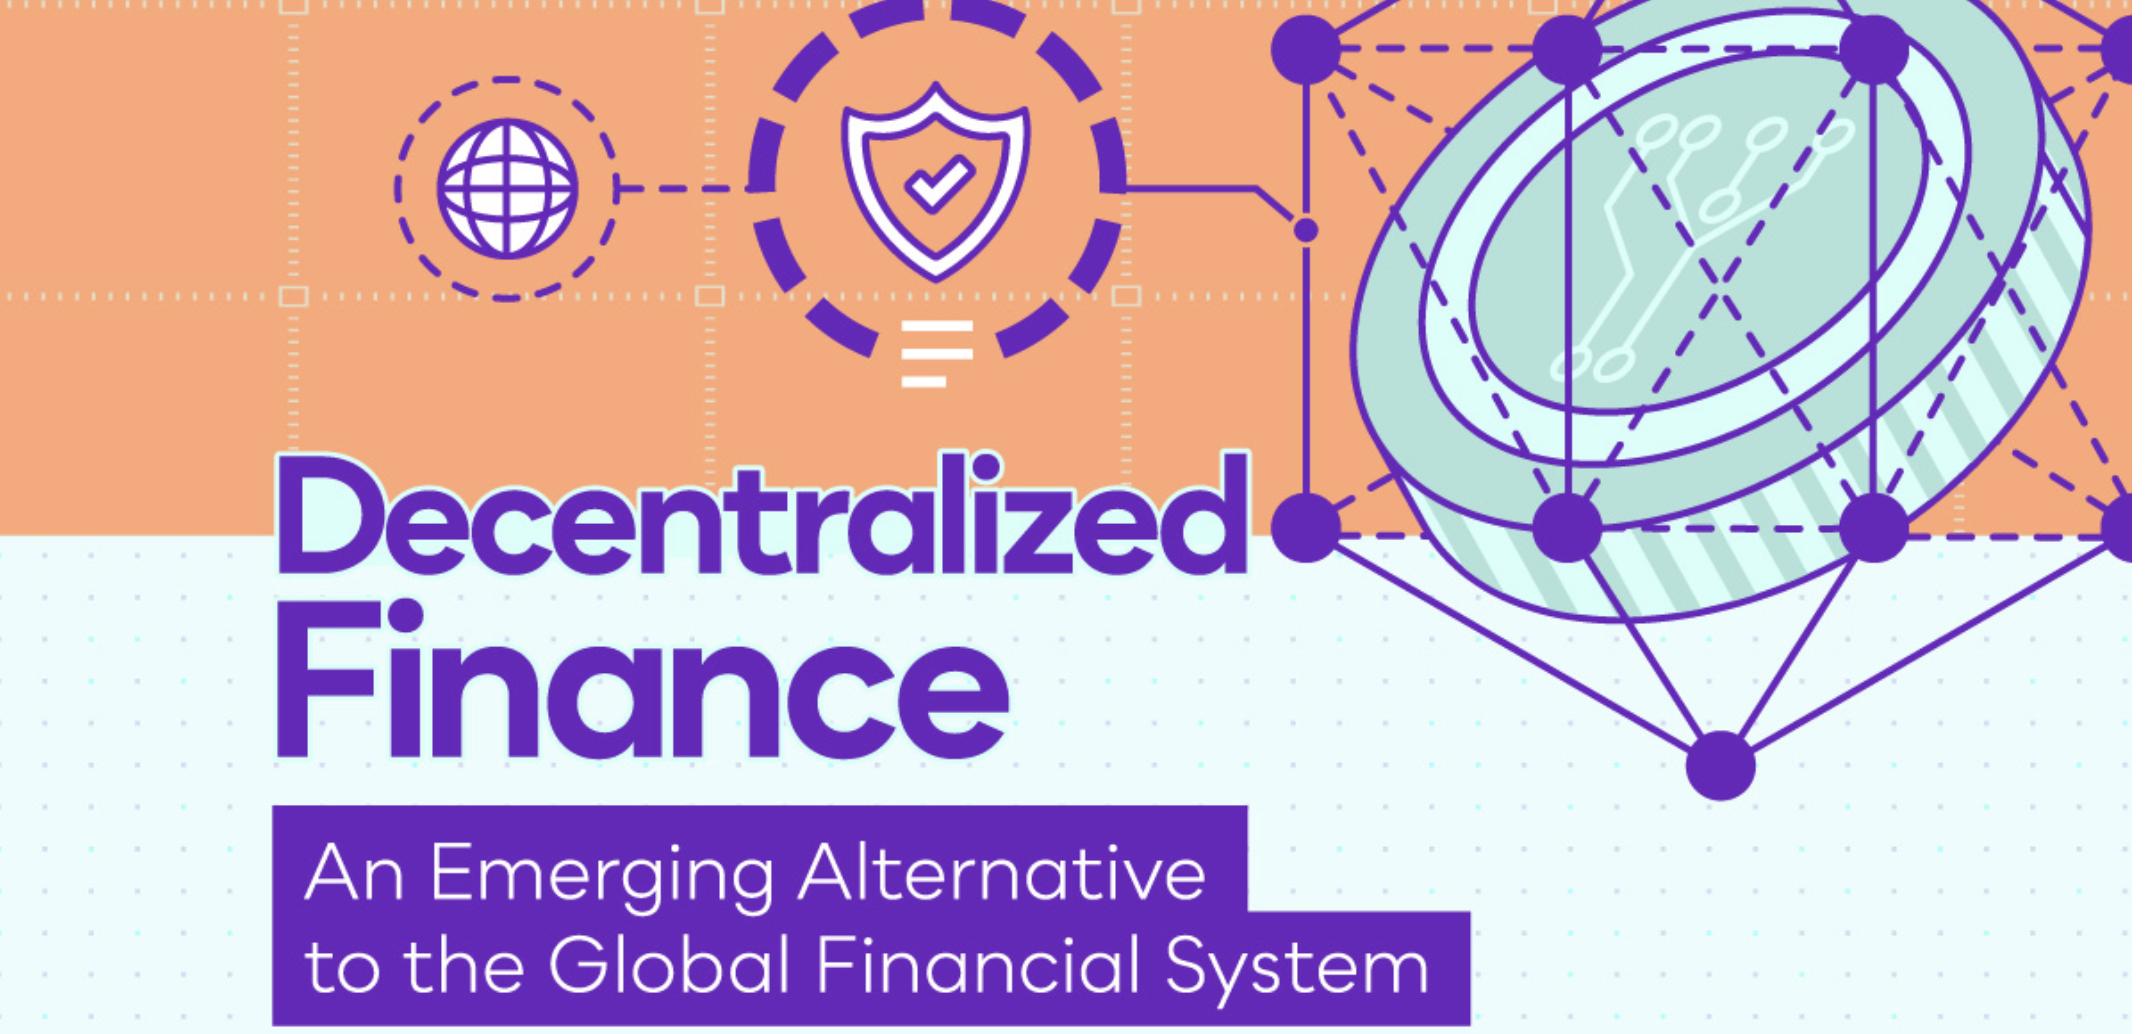 DeFi:去中心化金融及其未来